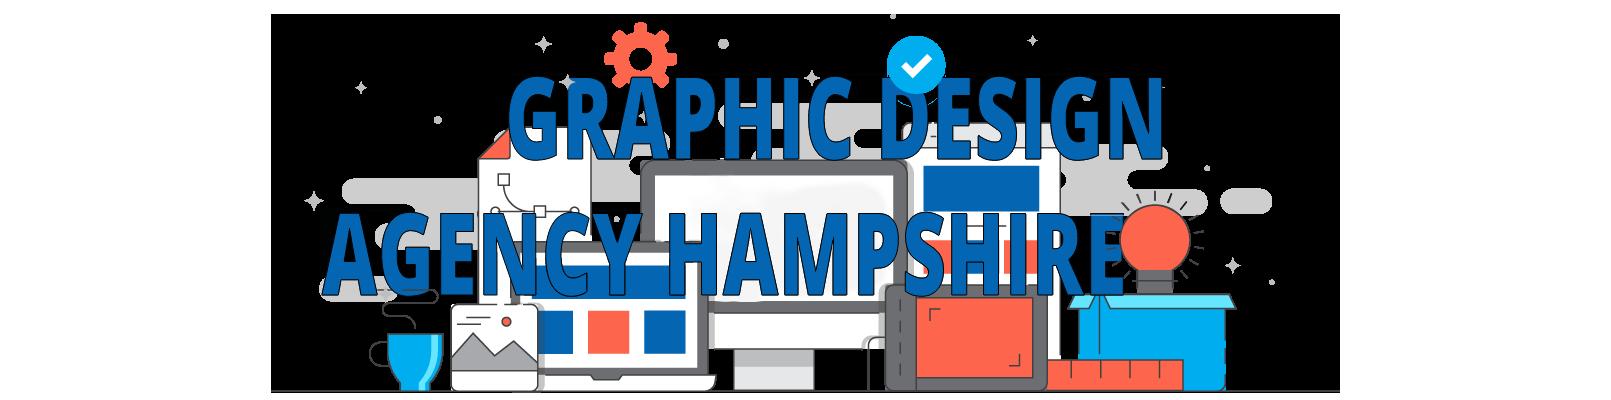 Graphic-Design-agency-Hampshire